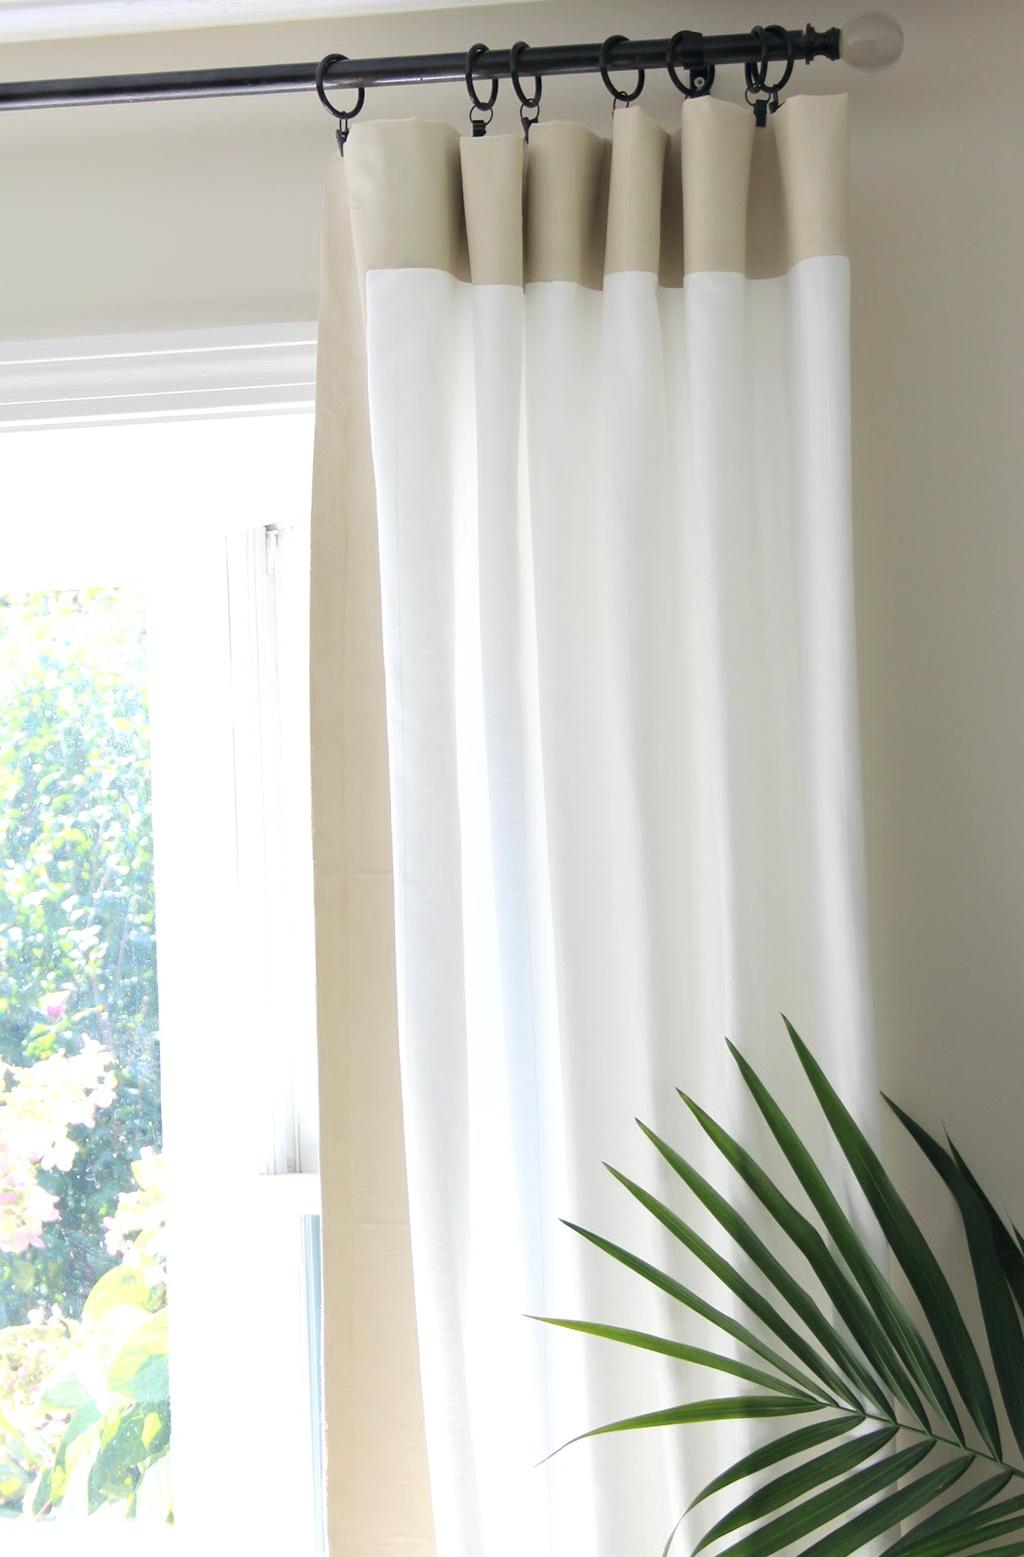 extra long curtain rods diy home design ideas. Black Bedroom Furniture Sets. Home Design Ideas